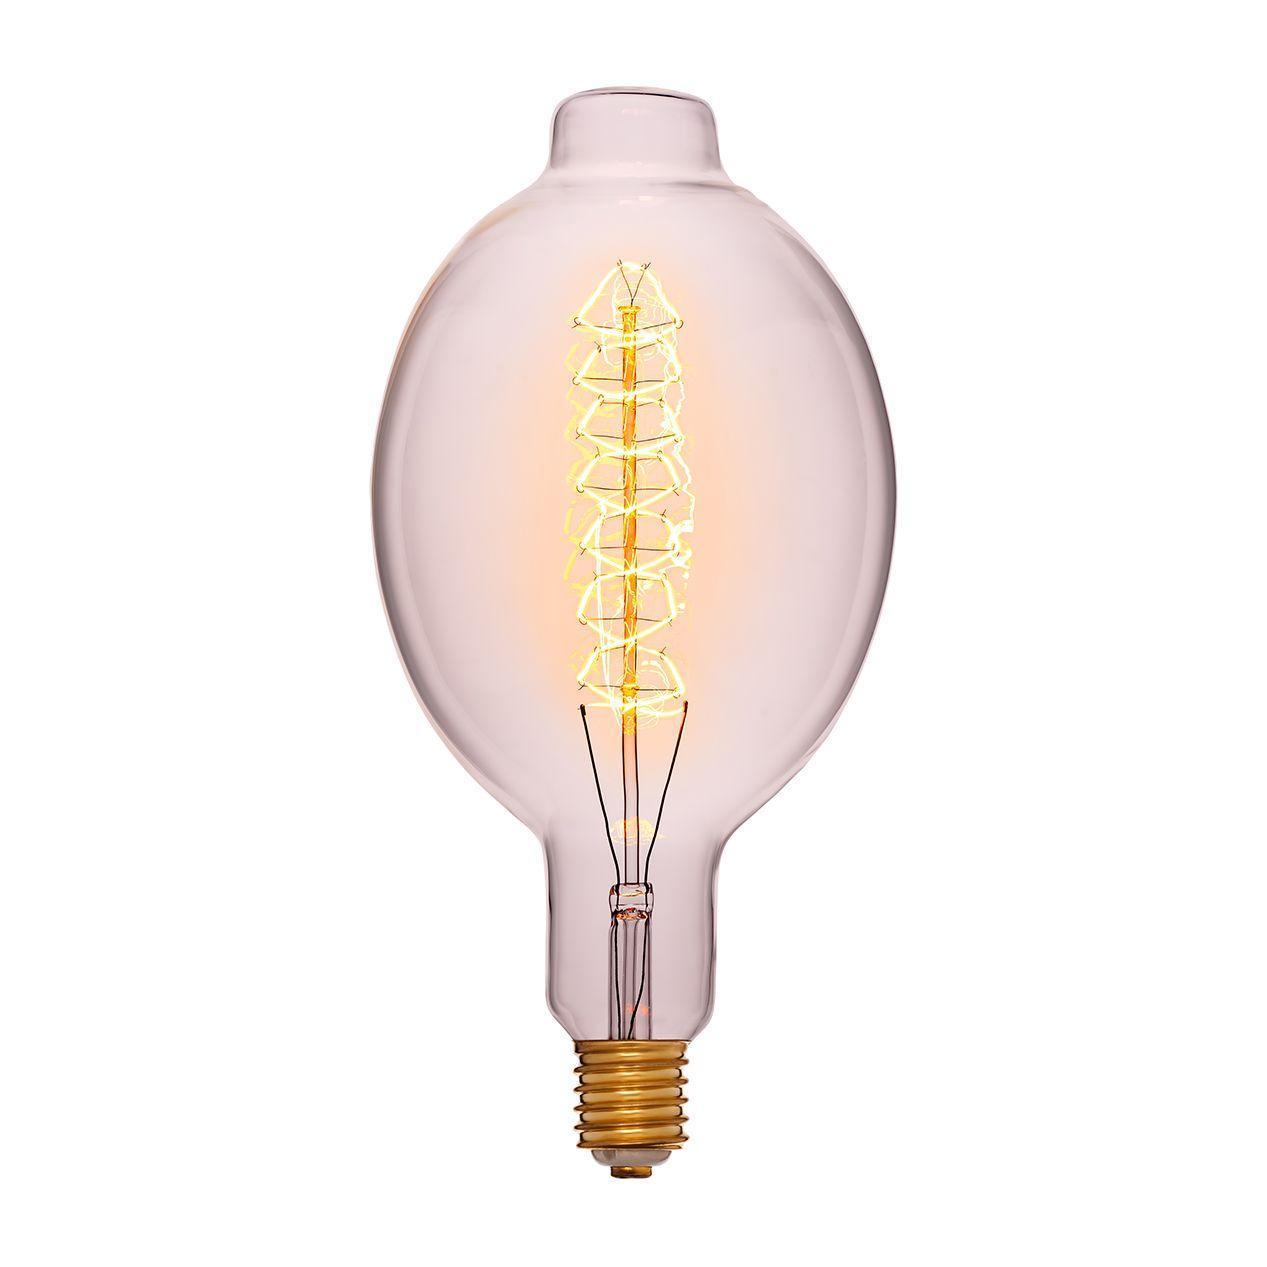 Лампа накаливания E40 95W прозрачная 053-822 цена